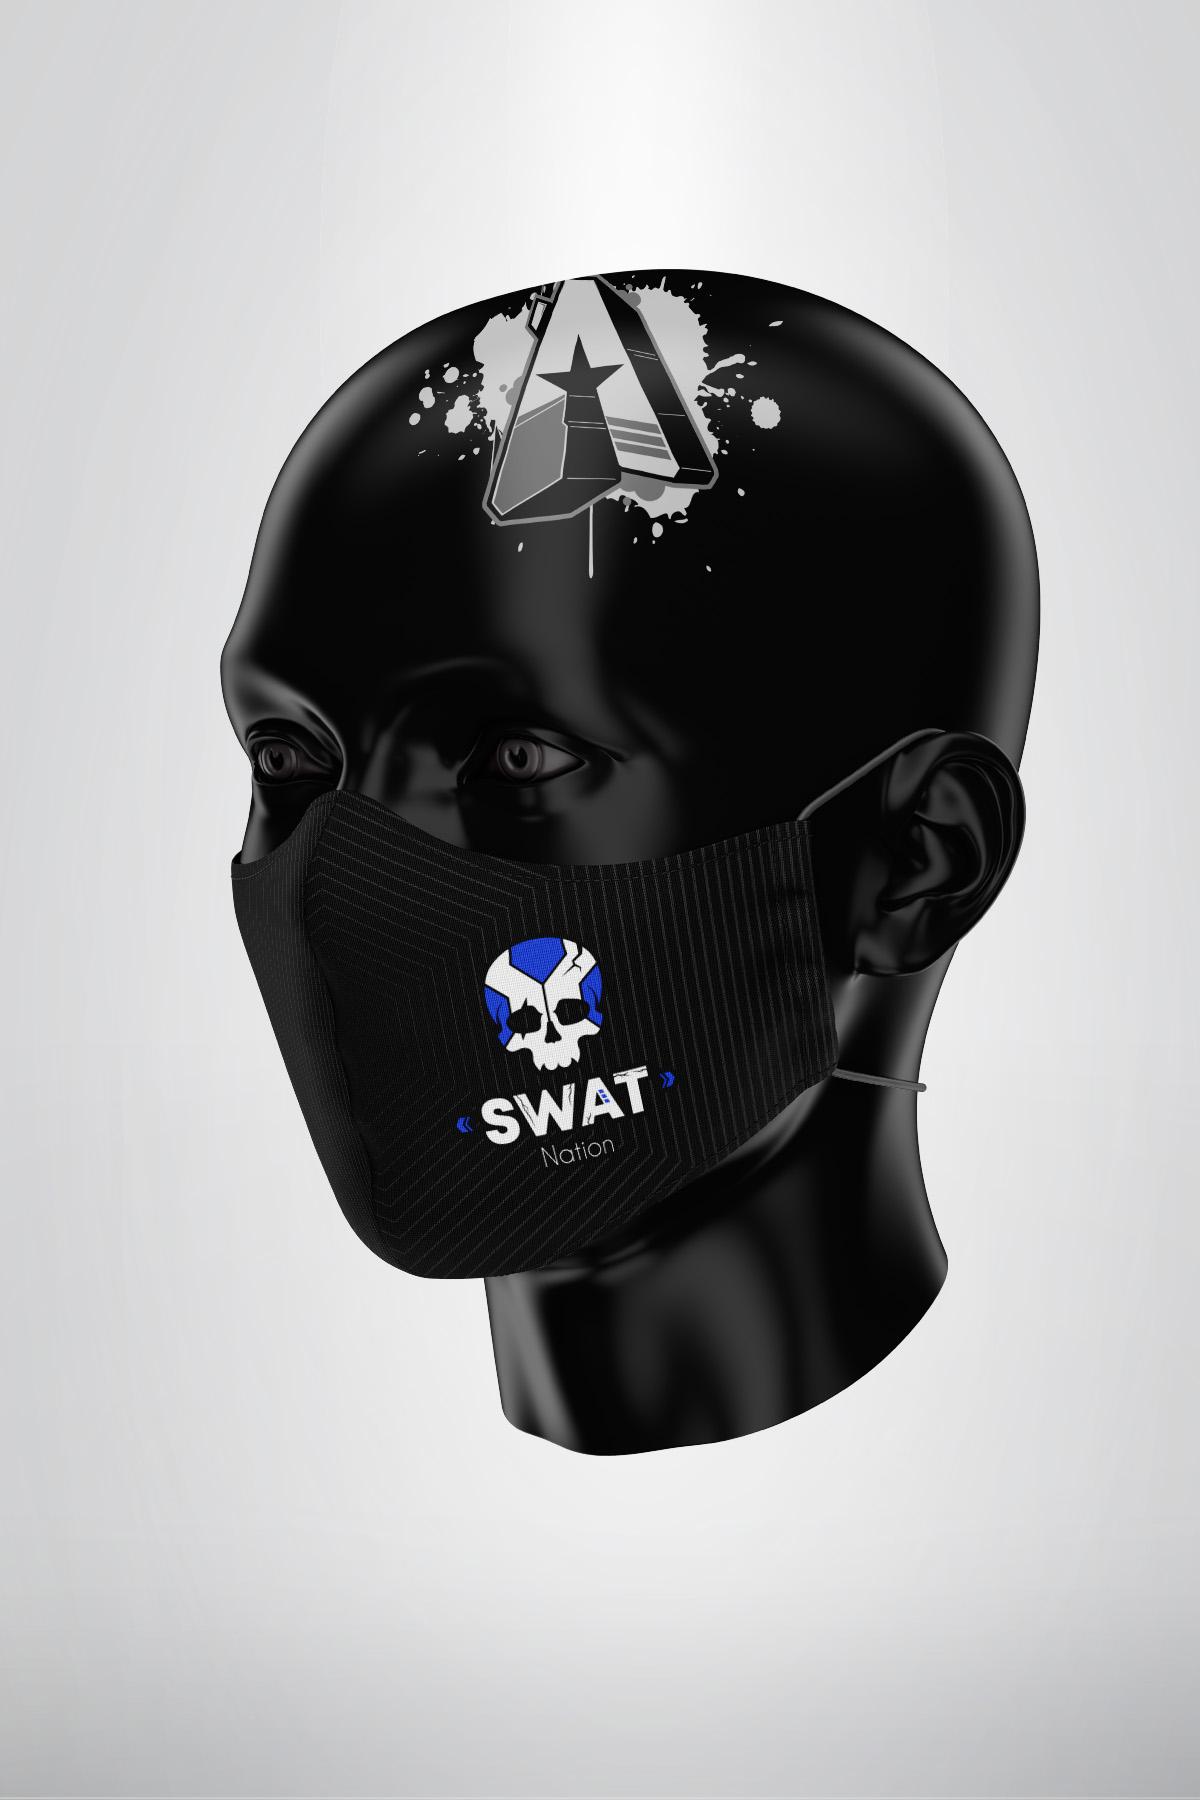 swatnationblackmask